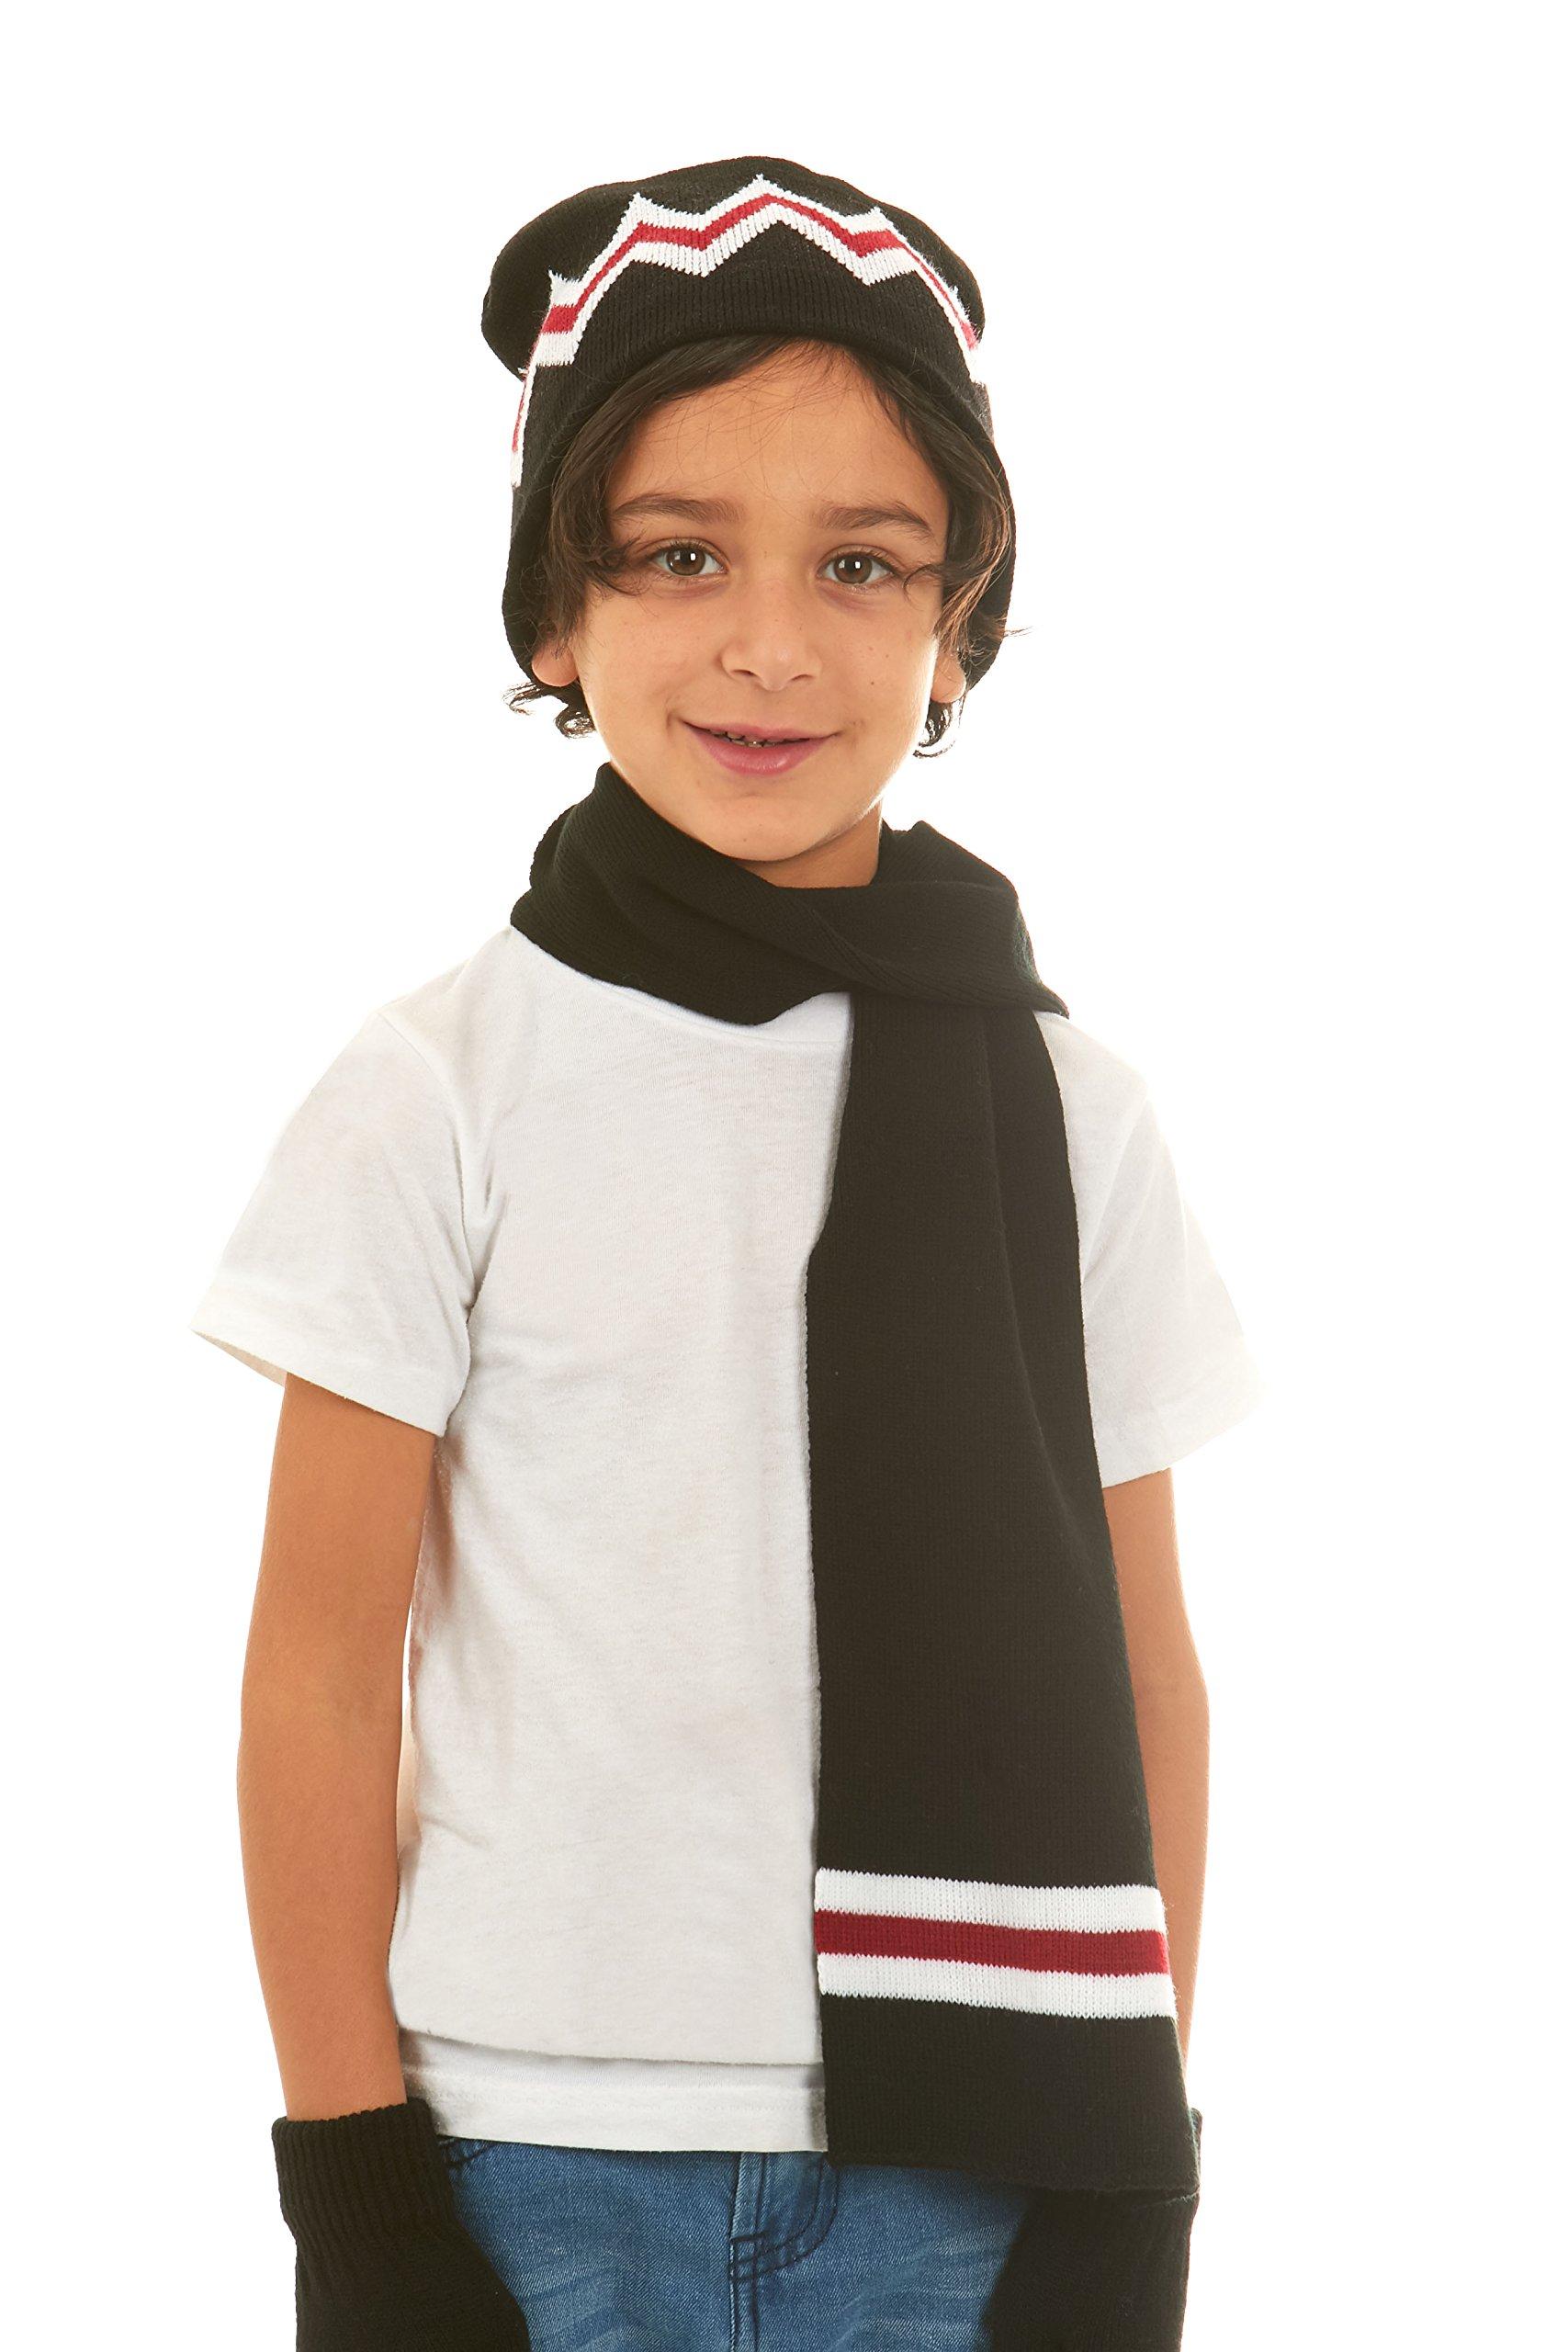 Polar Wear Boys Knit Hat, Scarf And Gloves Set - Black/Red by Polar Wear (Image #2)